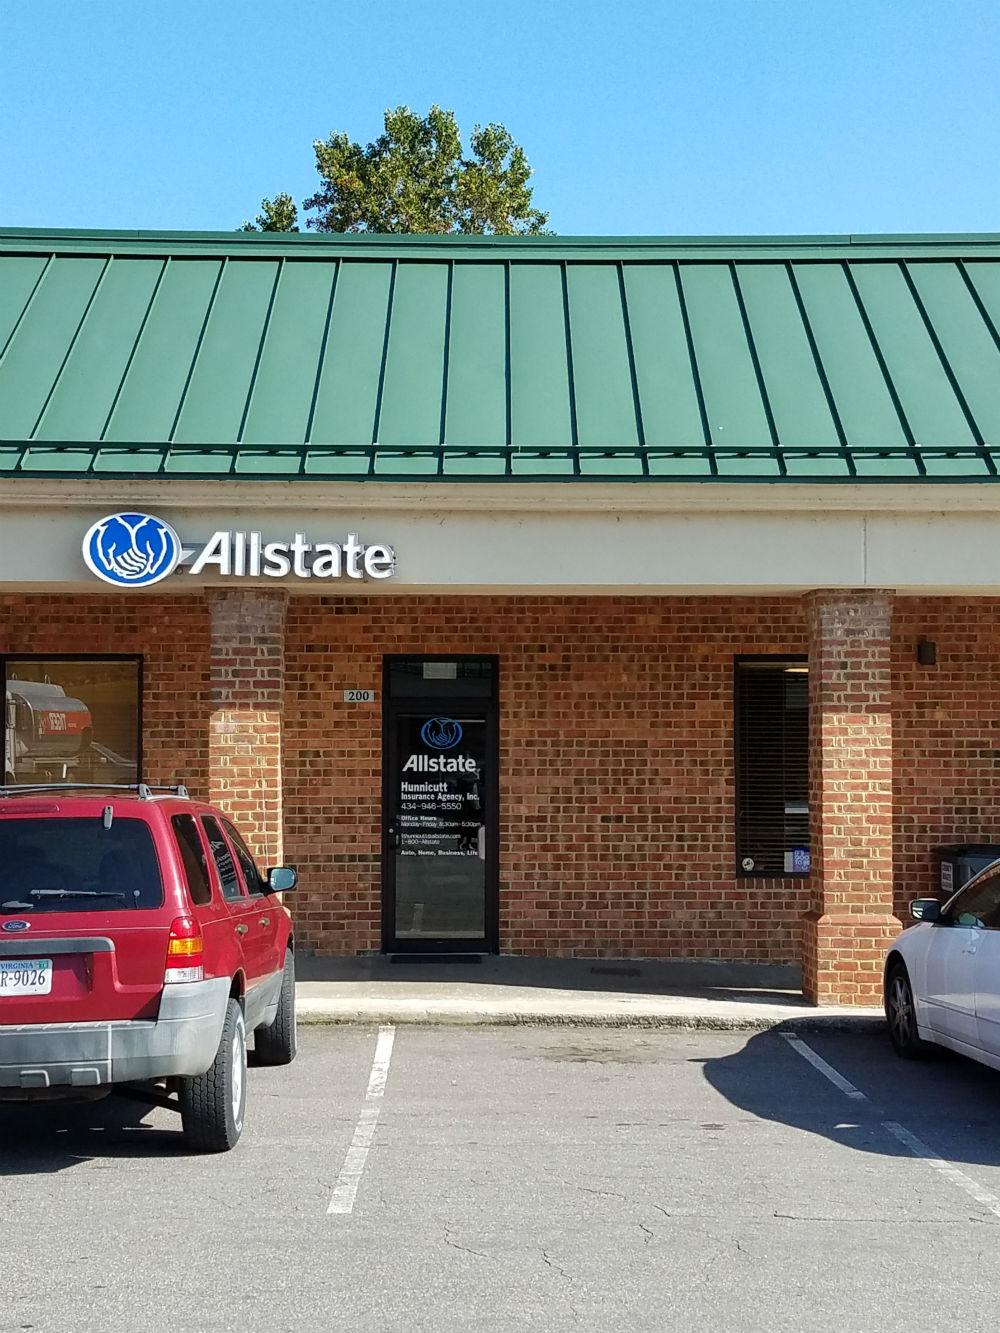 Fred Hunnicutt: Allstate Insurance image 1